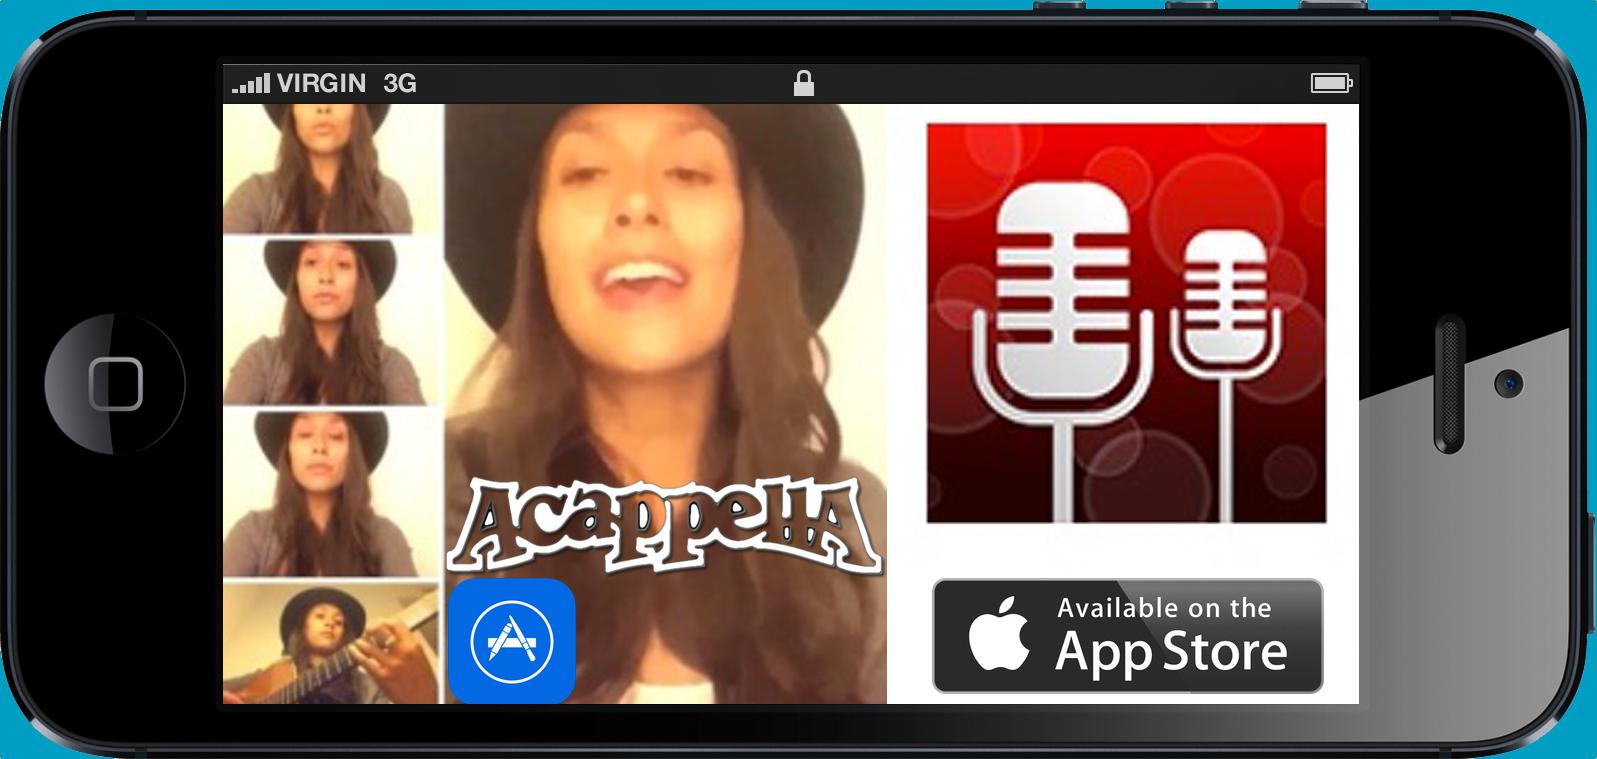 Acapella from PicPlayPost